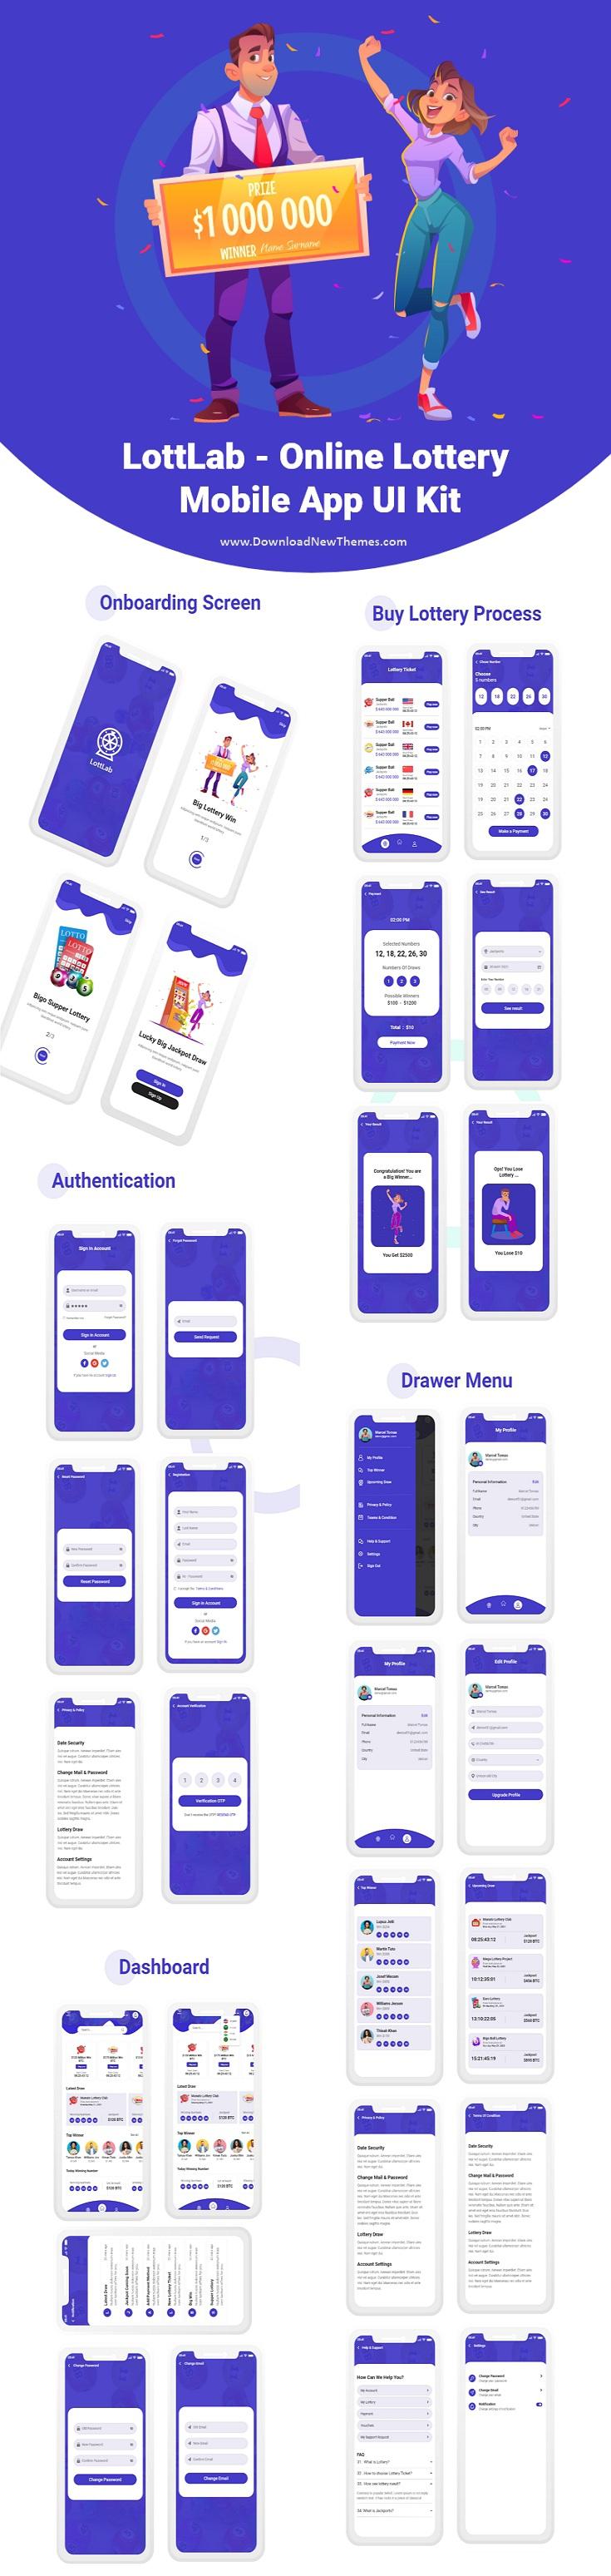 LottLab Online Lottery Mobile App UI Kit Review